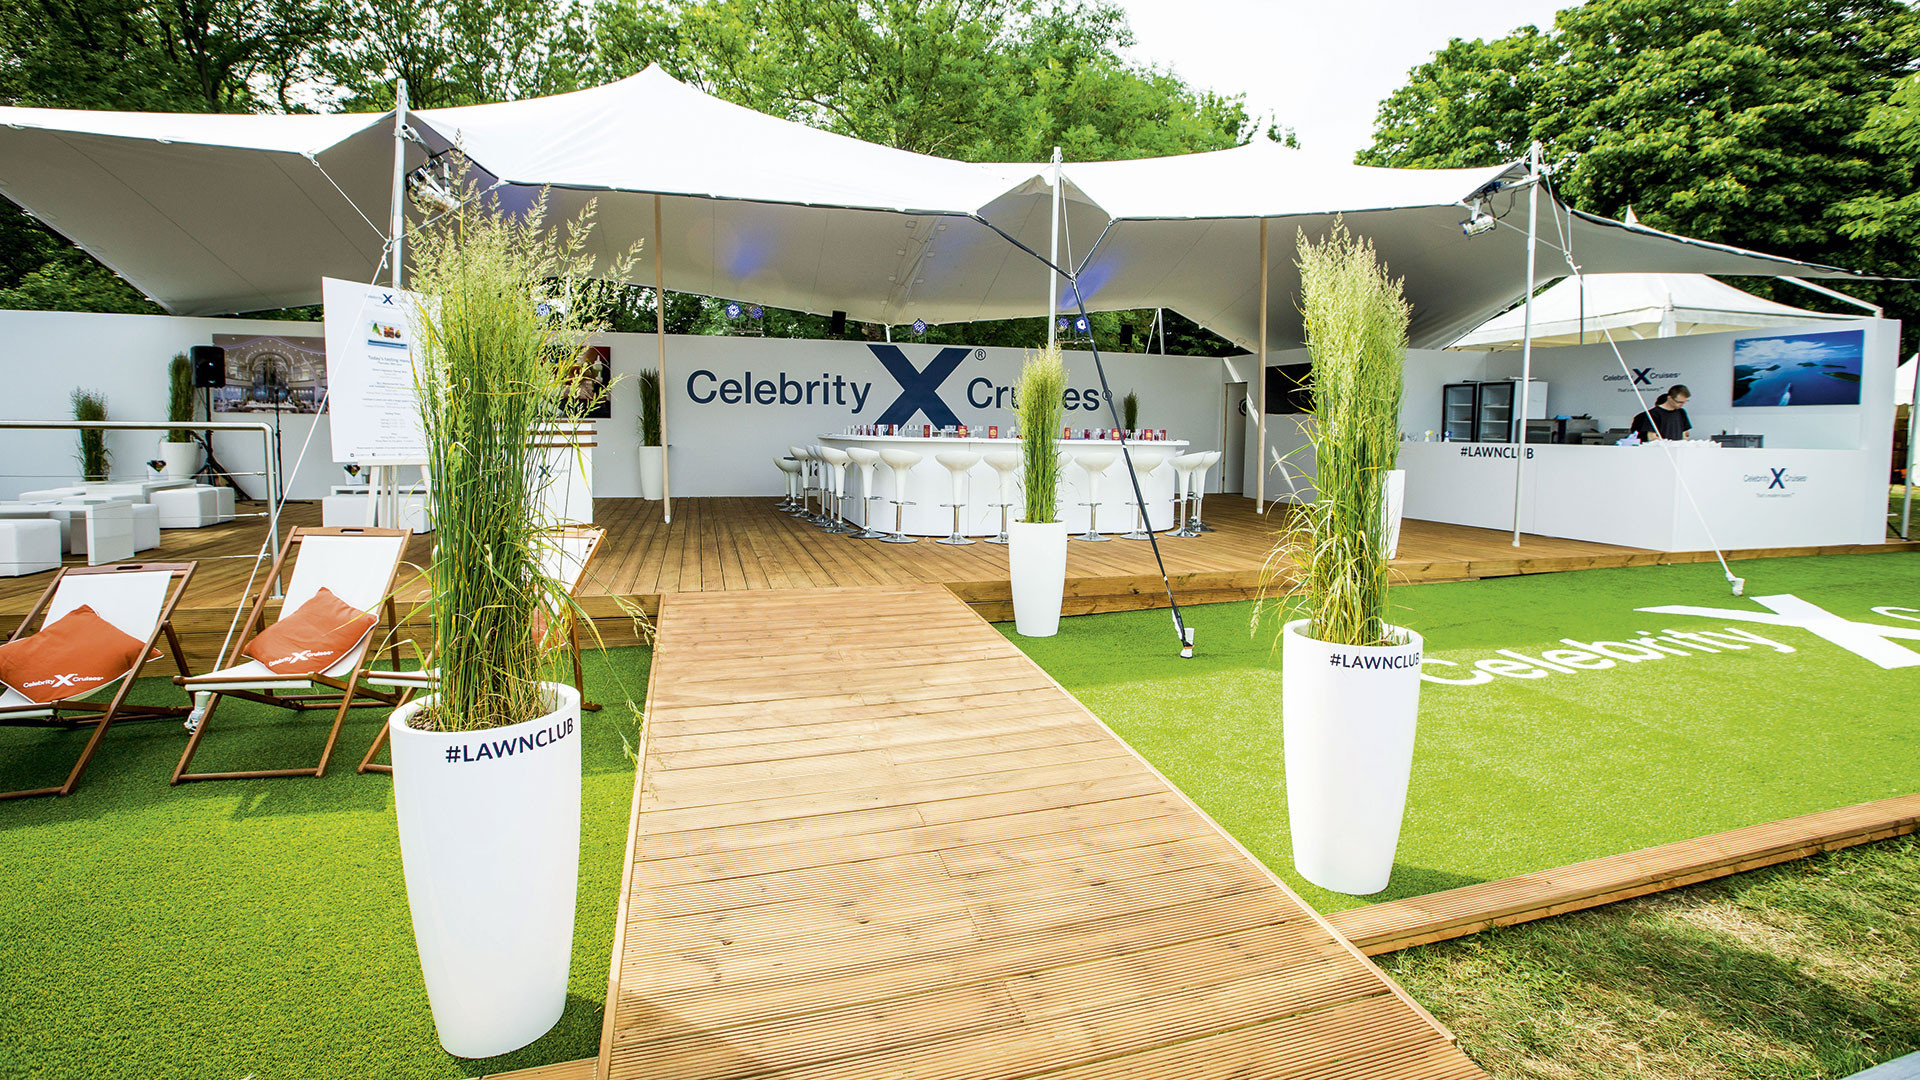 Celebrity Cruises' Lawn Club at Taste of London 2016